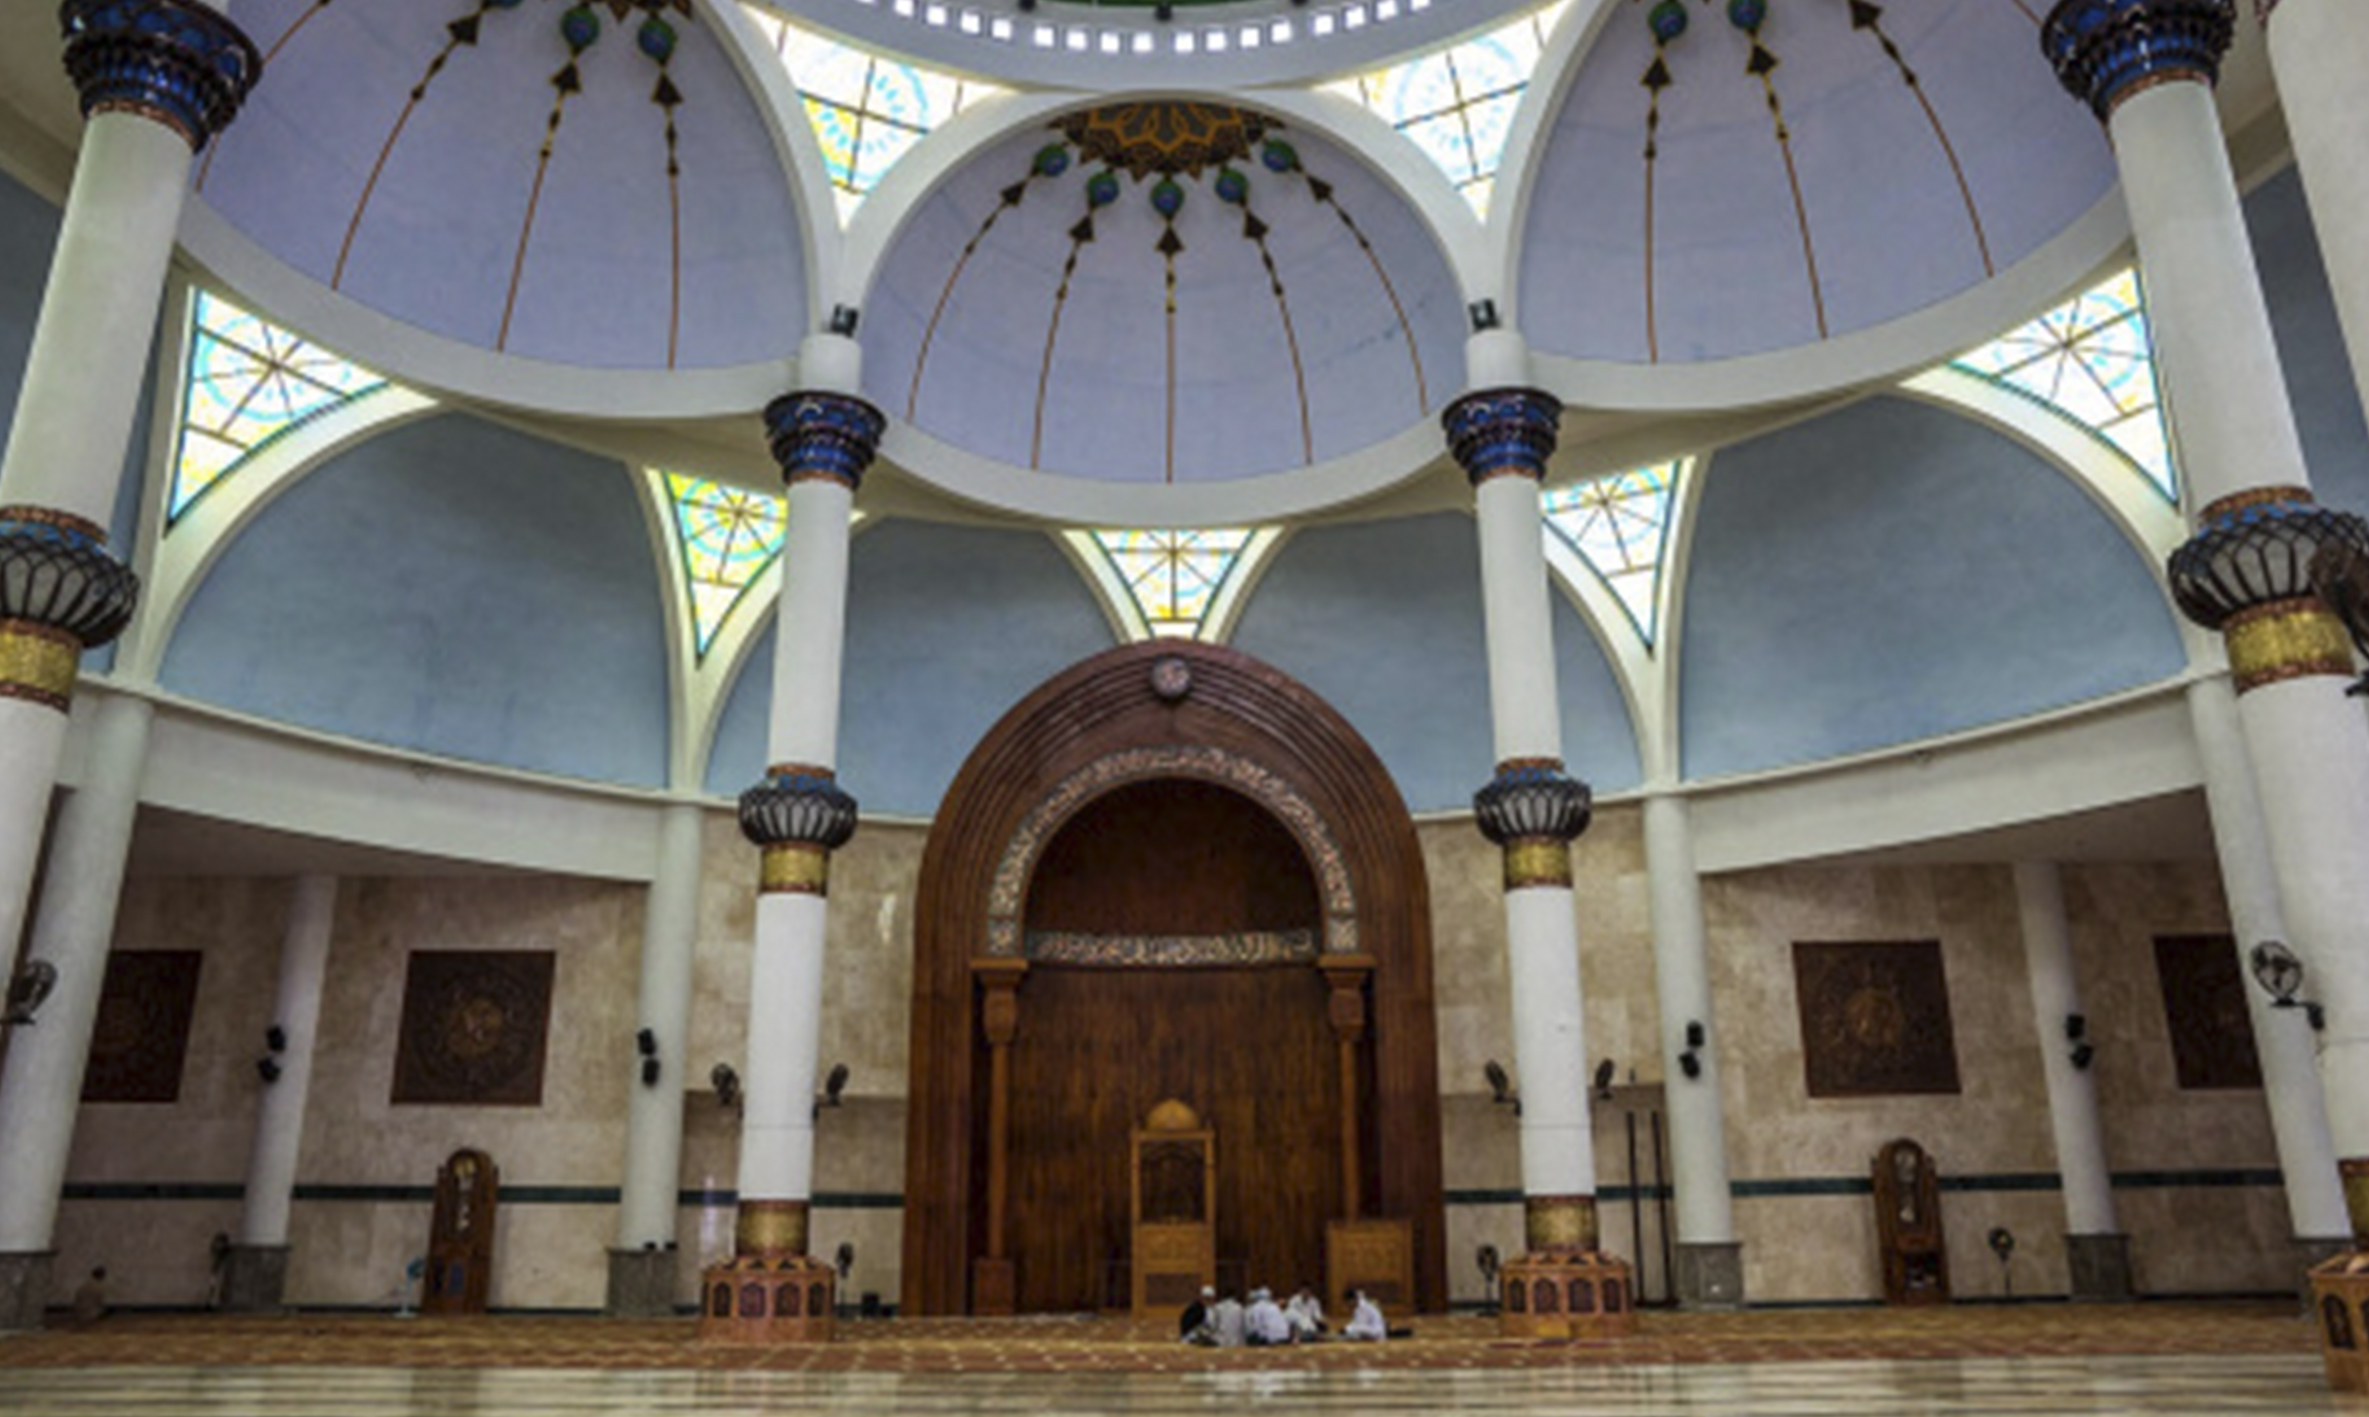 Bagian dalam Masjid Agung Natuna | Foto: wisatanatuna.wordpress.com